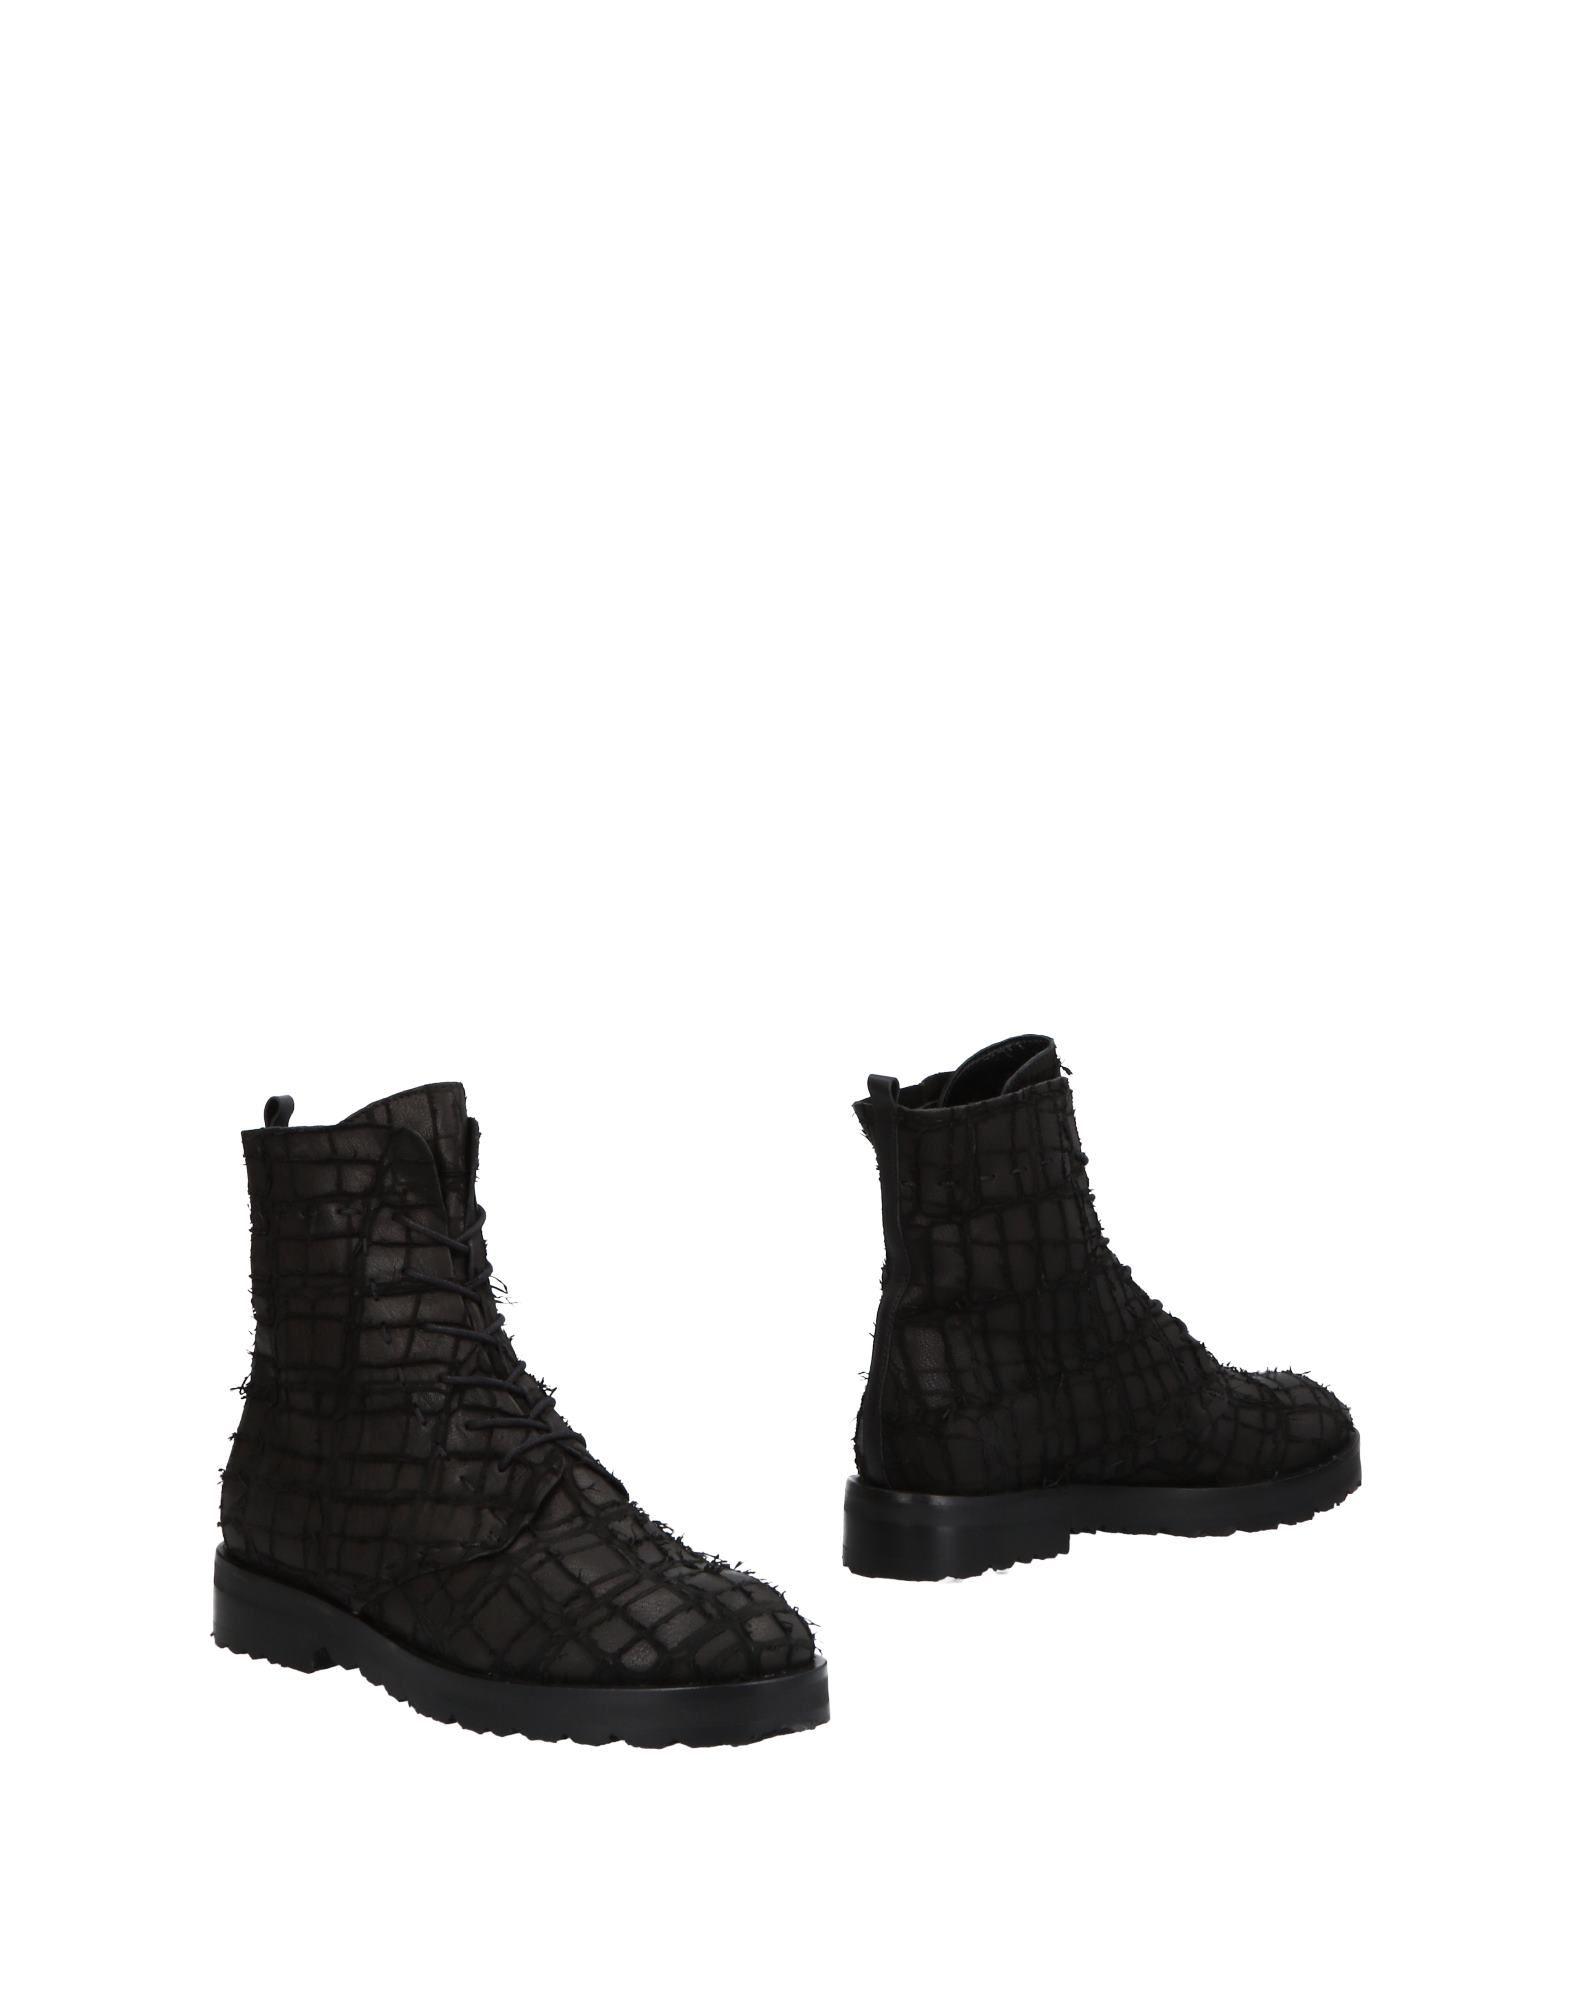 Stilvolle billige Stiefelette Schuhe Puro Individual Secret Stiefelette billige Damen  11507870MJ 514701